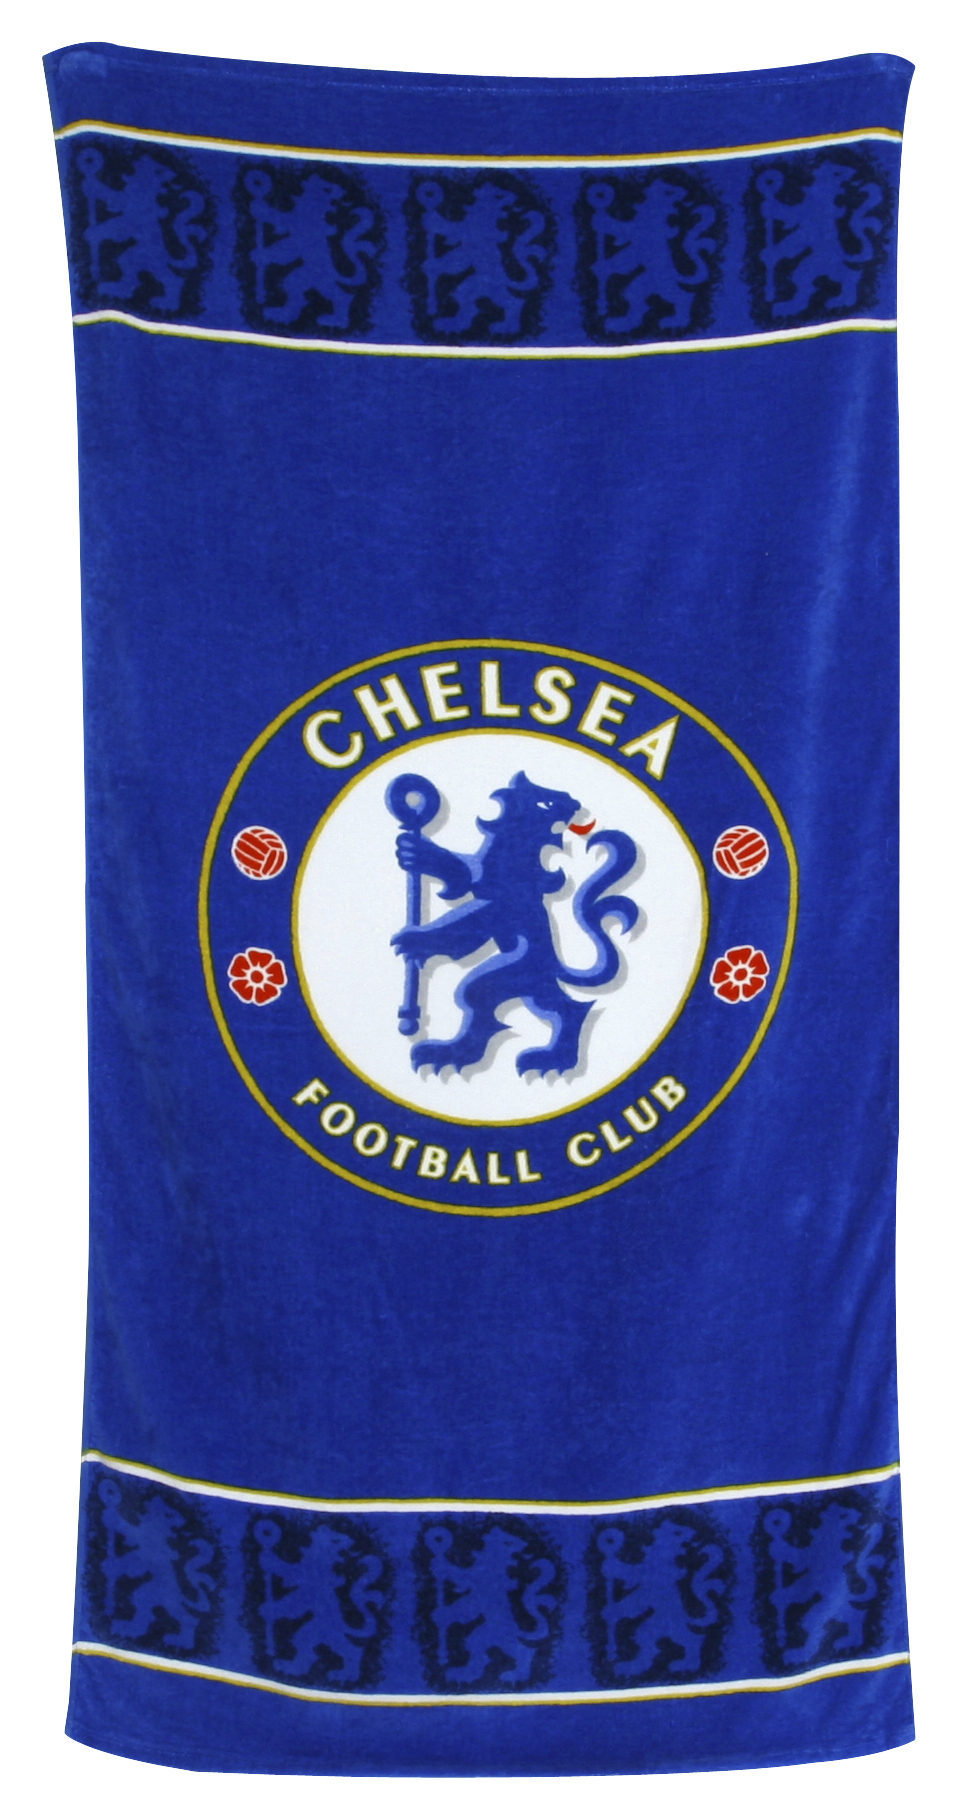 Chelsea Chelsea Border Crest Towel